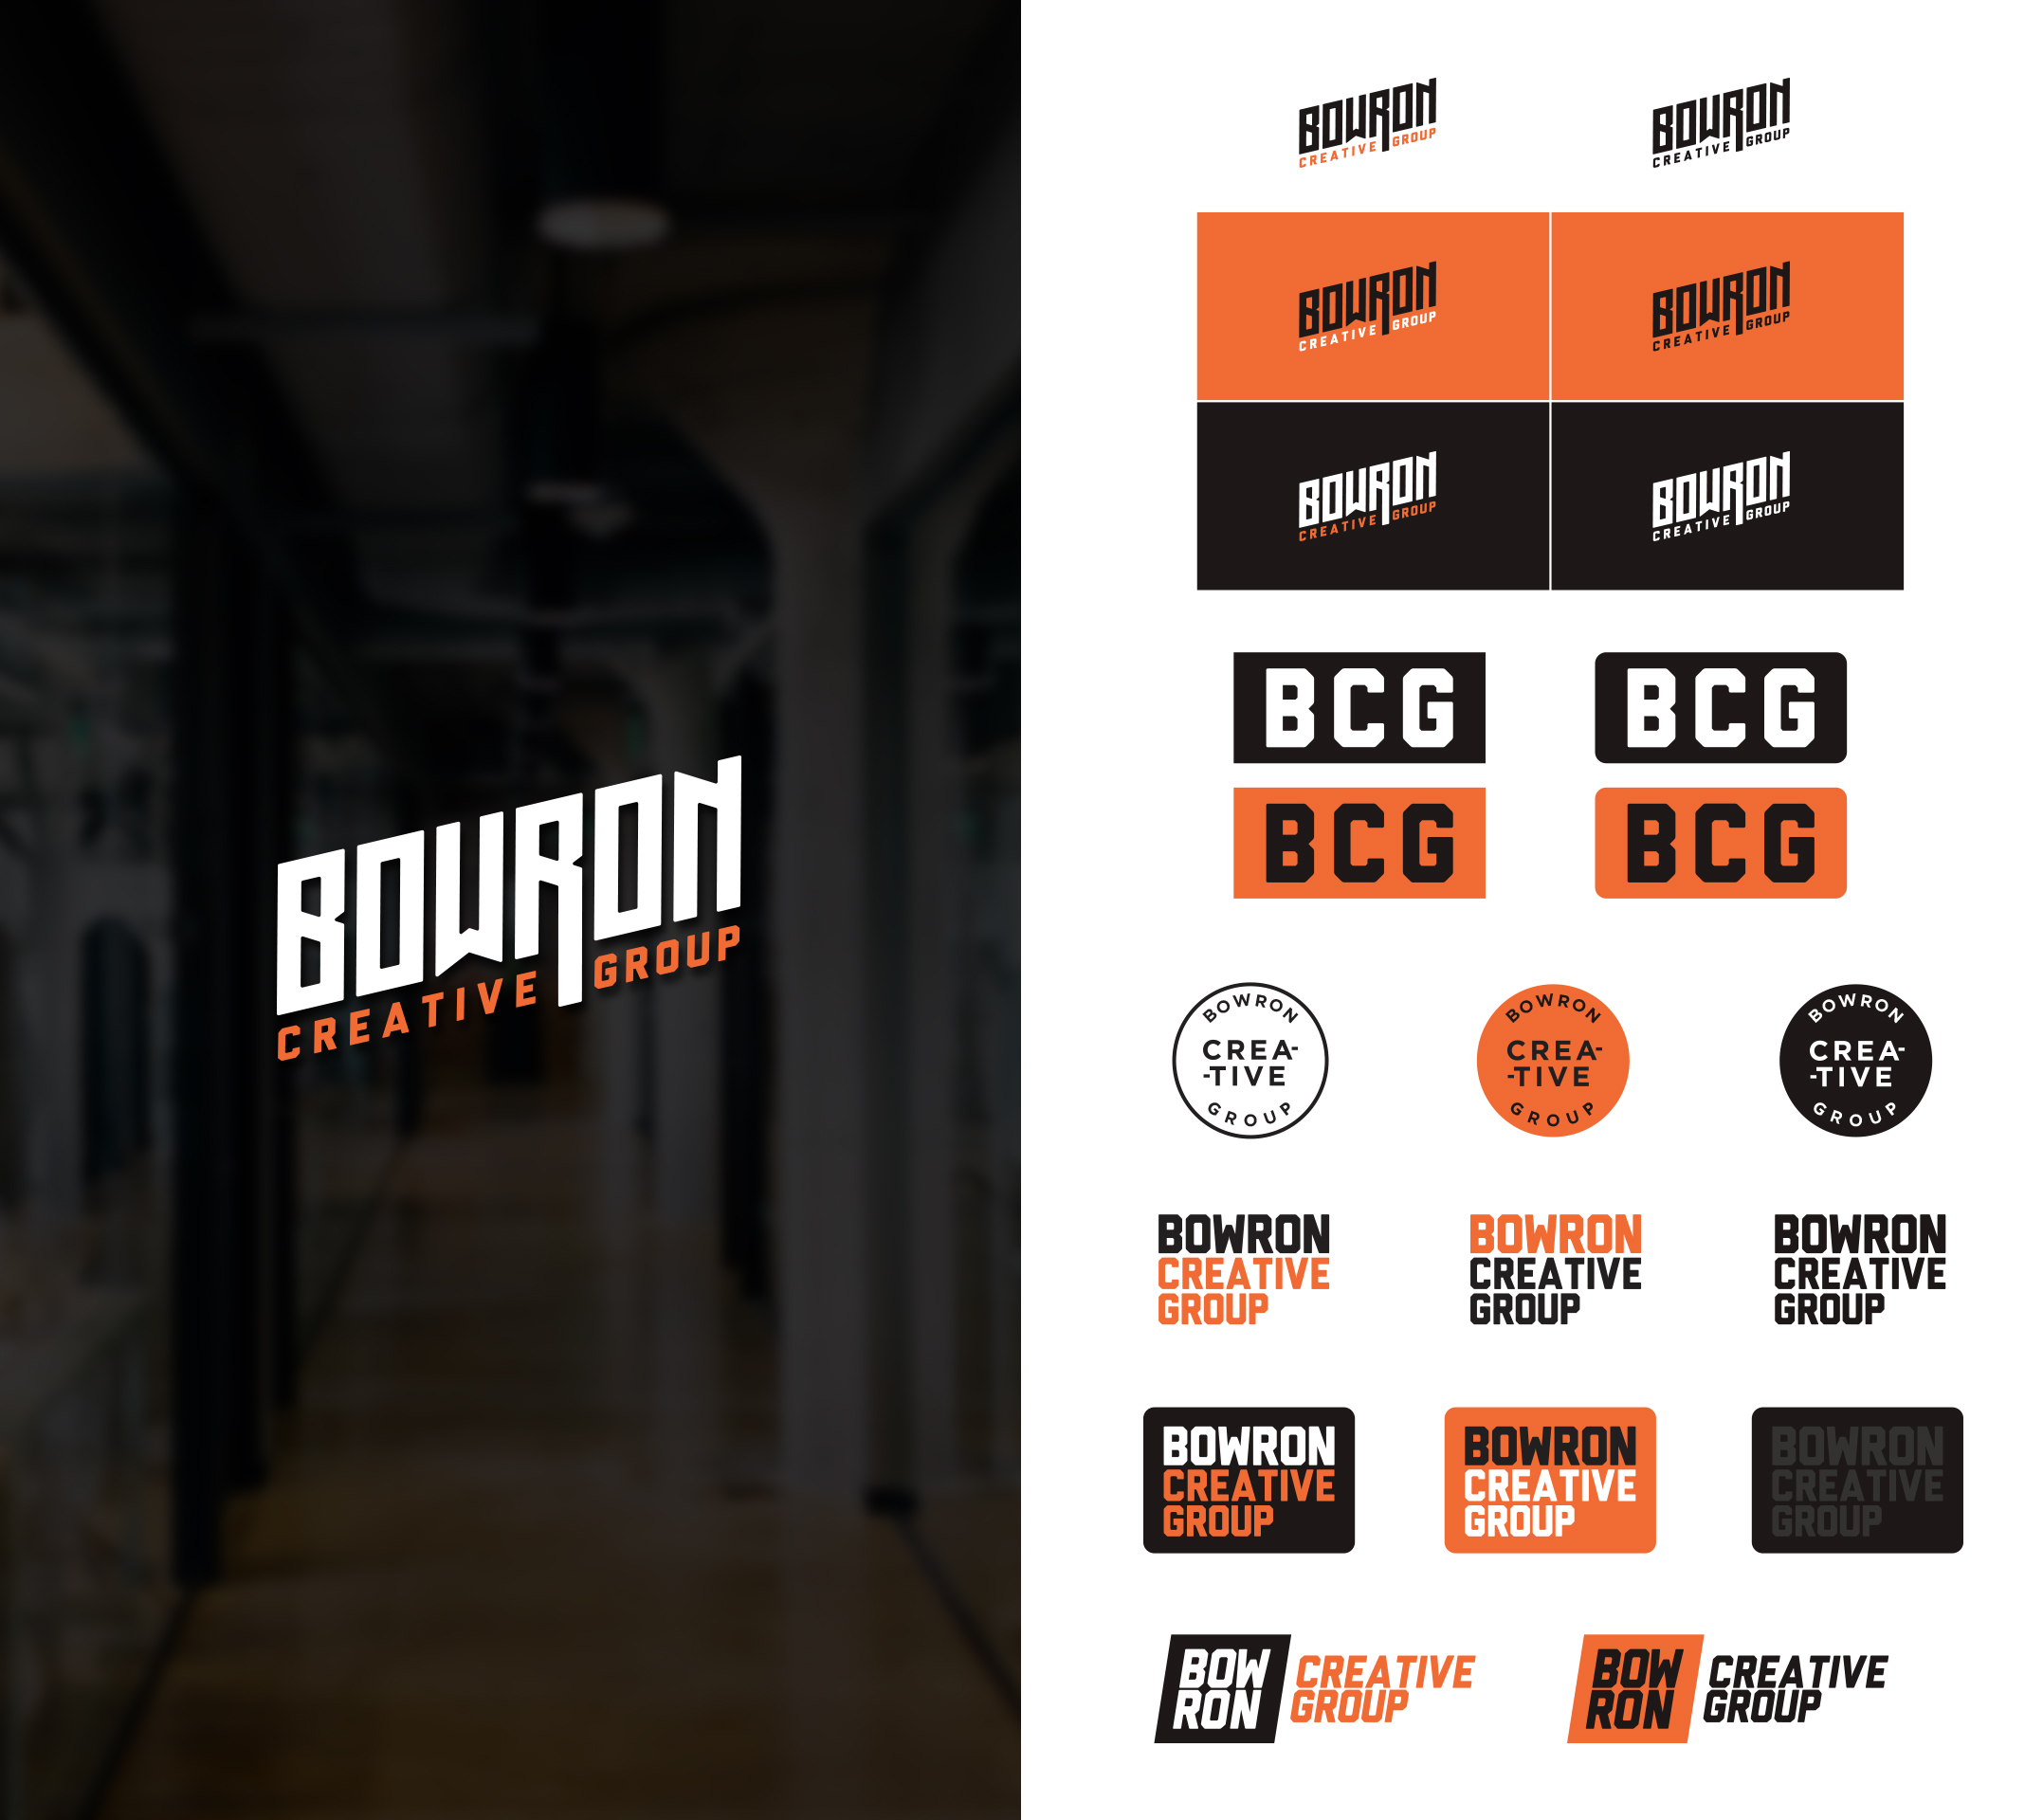 bowron_creative_group_logo_design_jimmy_bowron.jpg